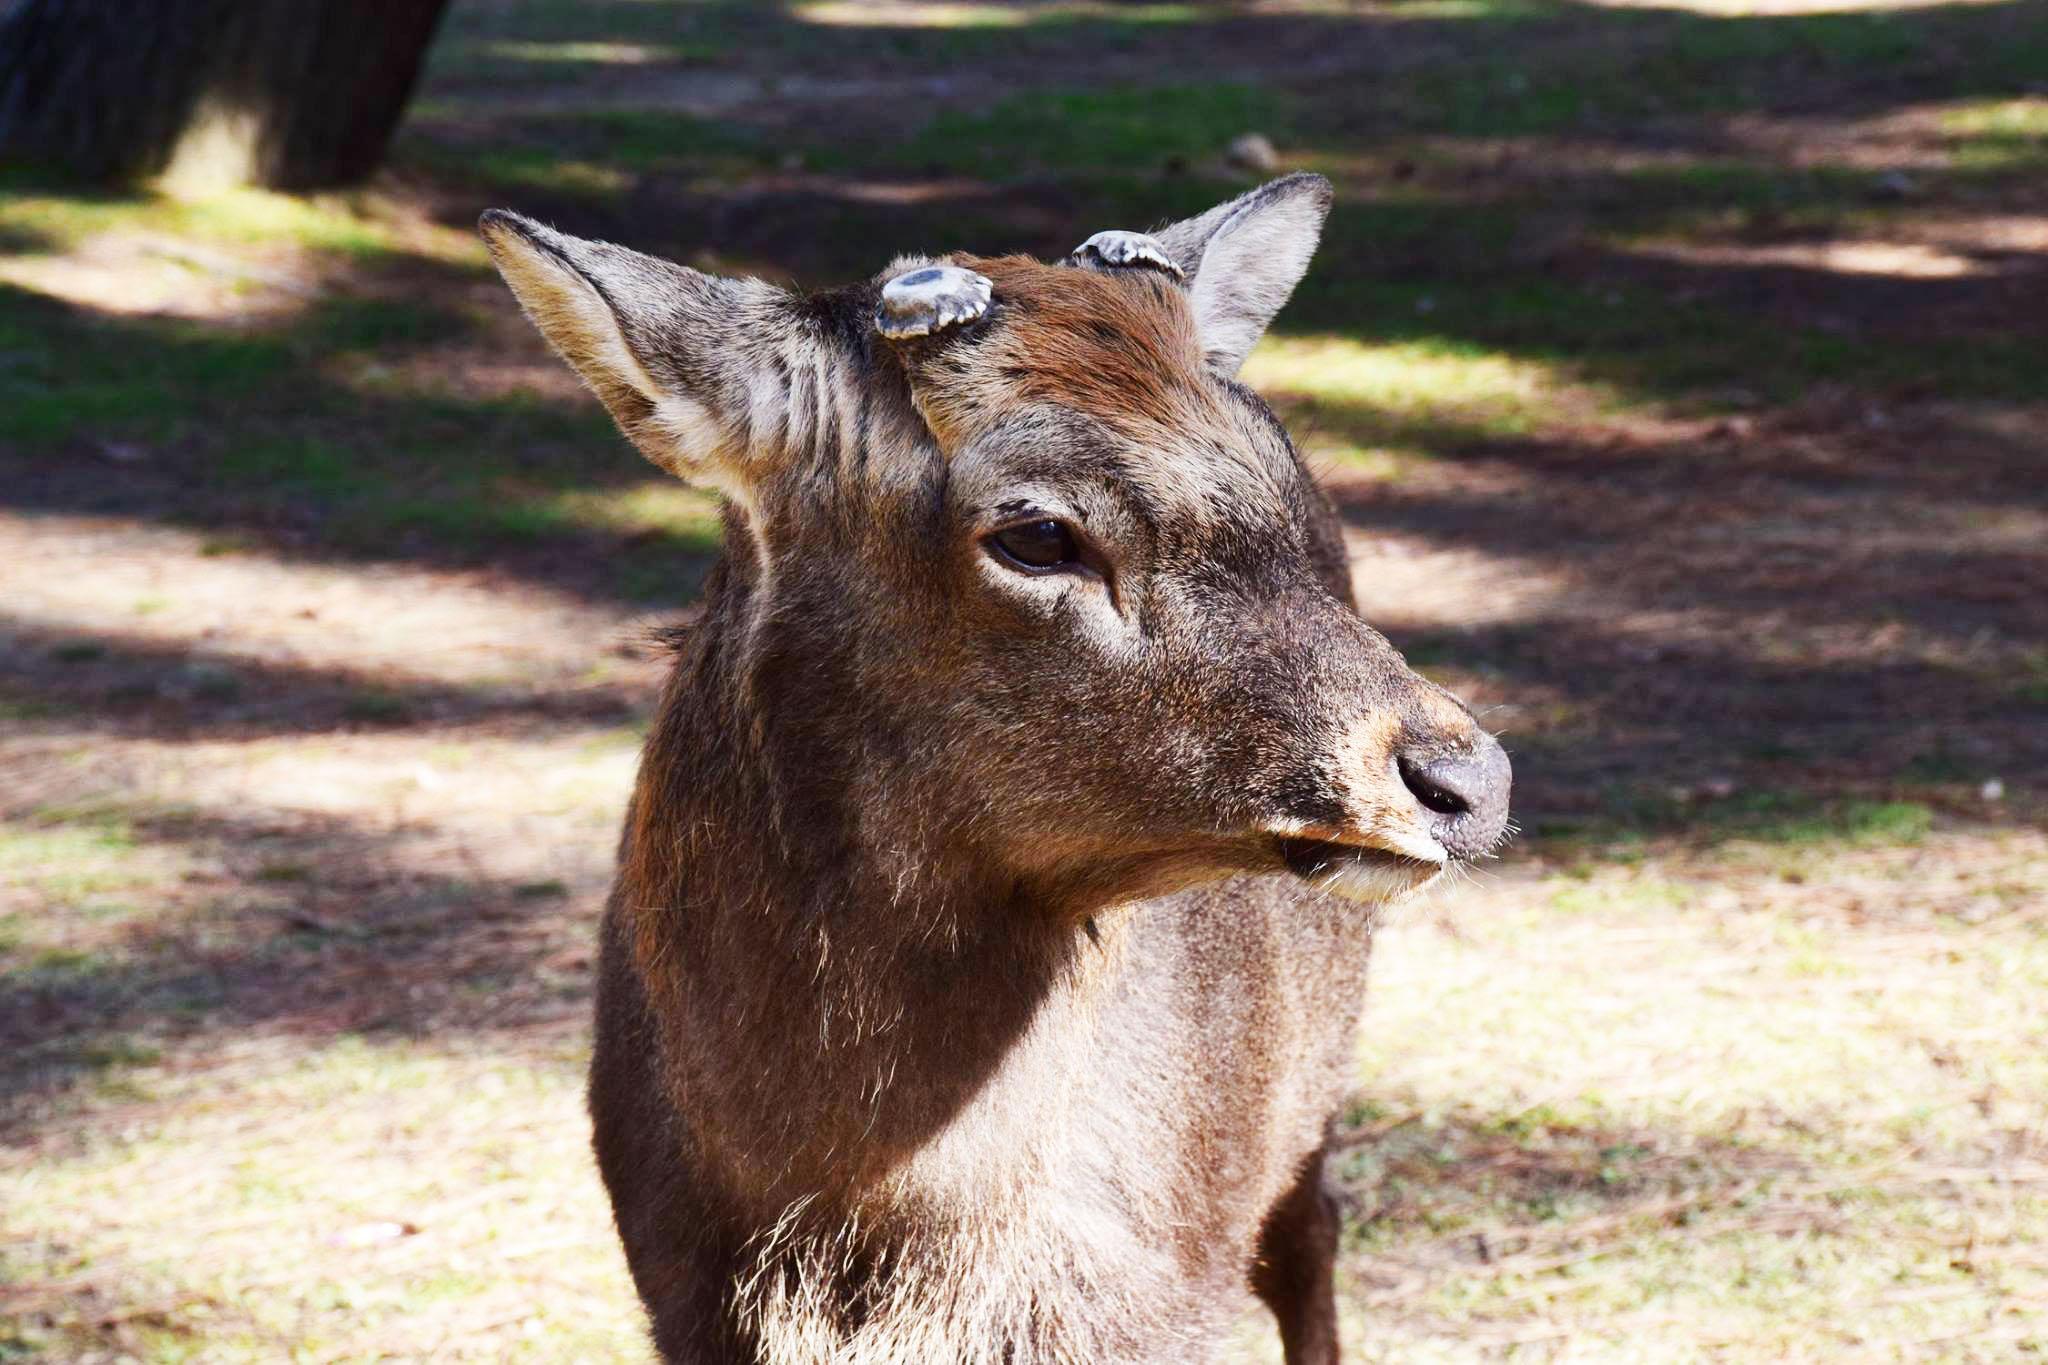 Original image of a deer